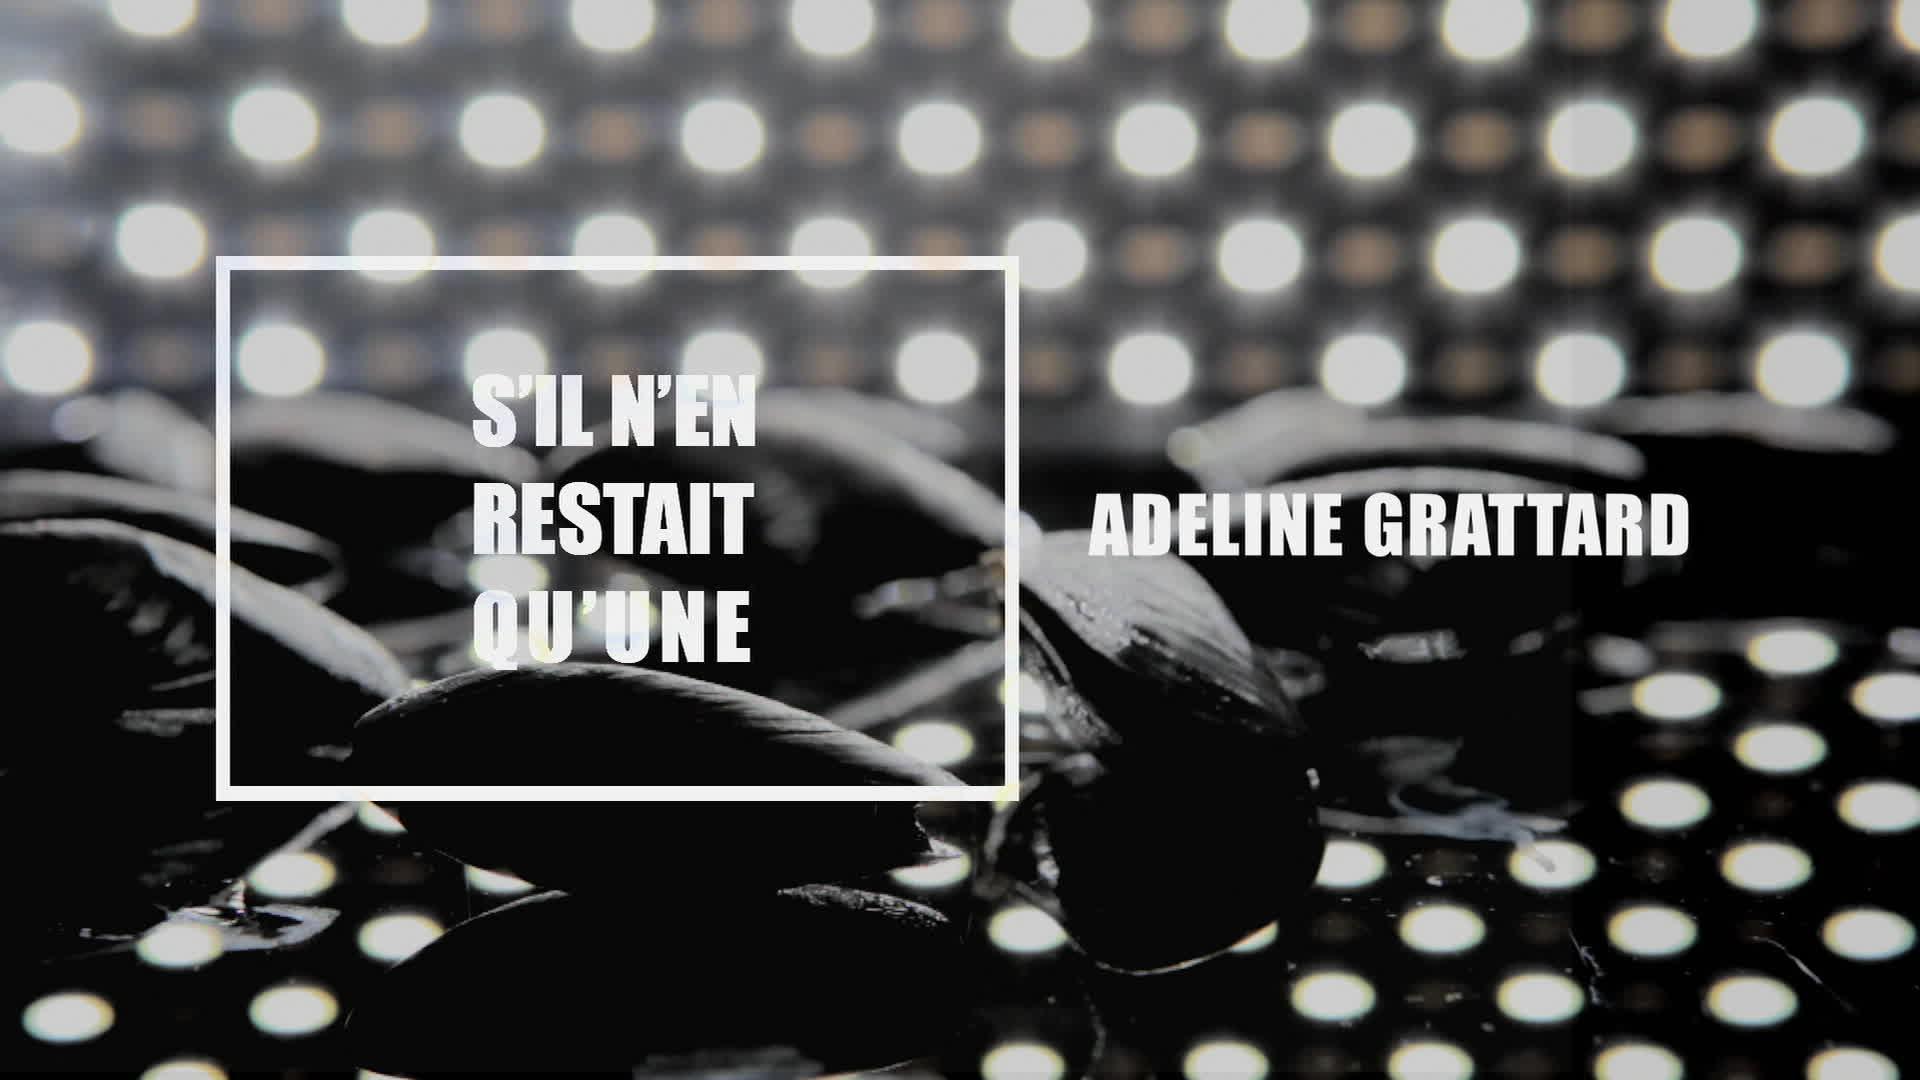 Adeline Grattard